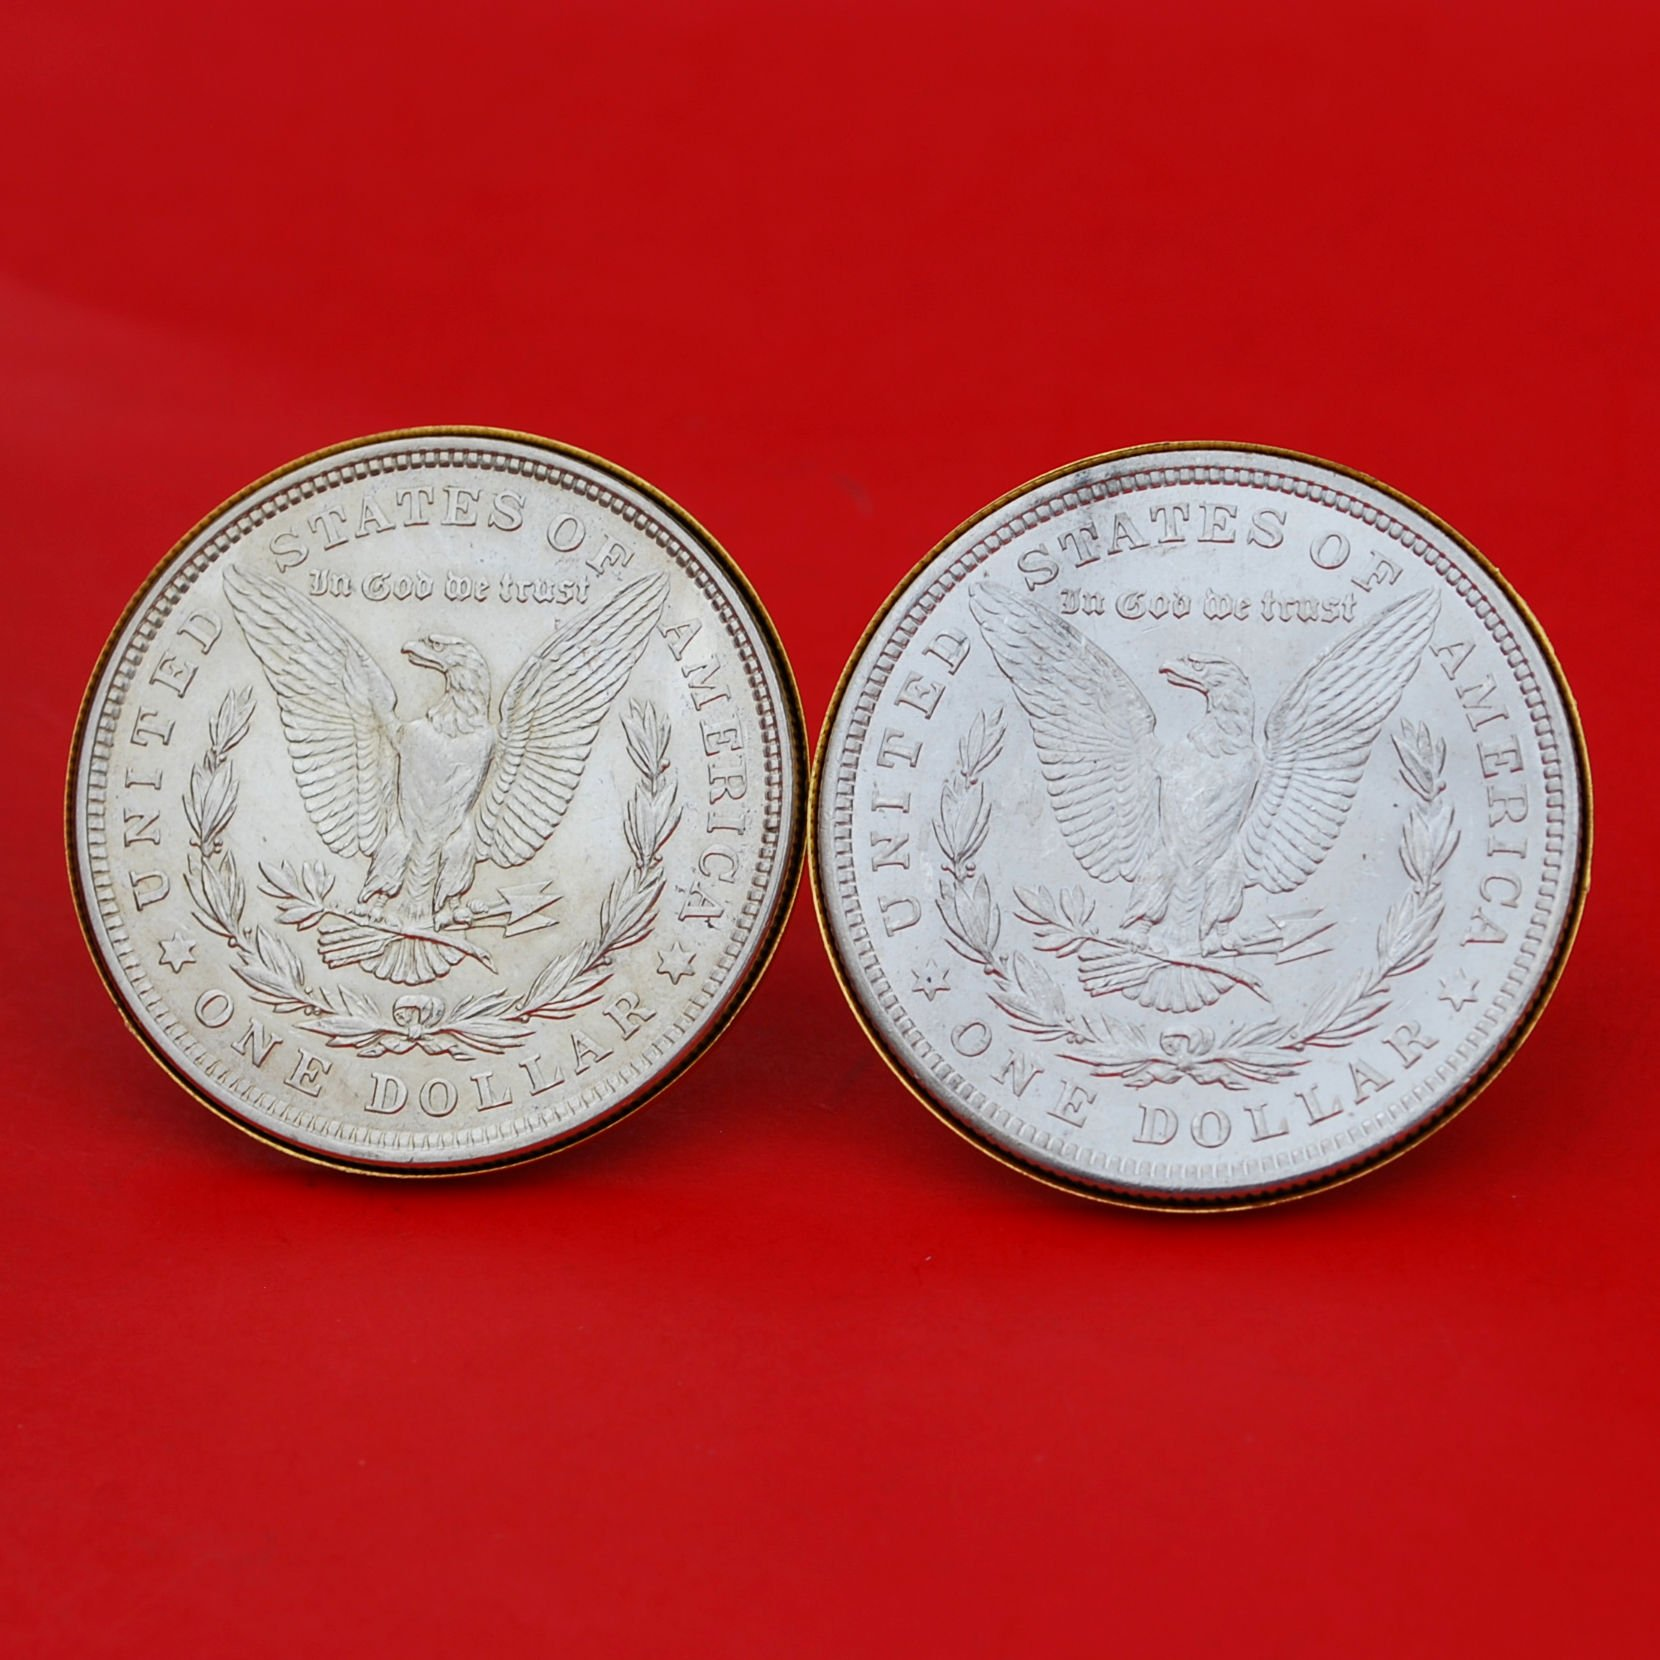 US 1921 Morgan Silver Dollar BU Uncirculated Gold Cufflinks NEW - REVERSE + REVERSE